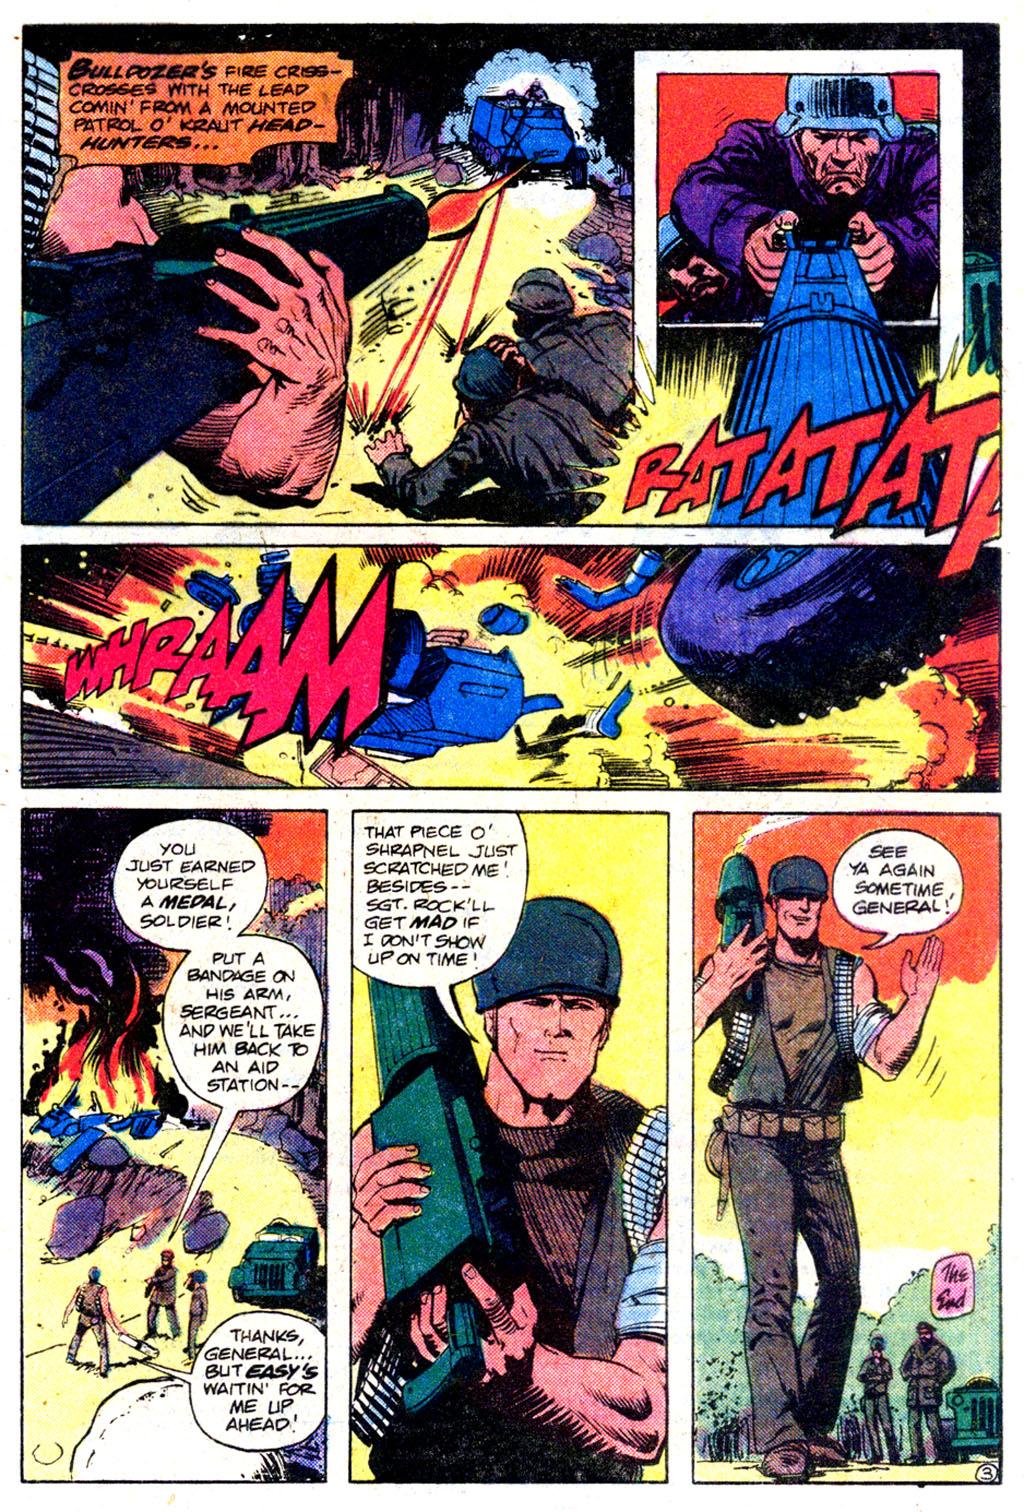 Read online Sgt. Rock comic -  Issue #349 - 26